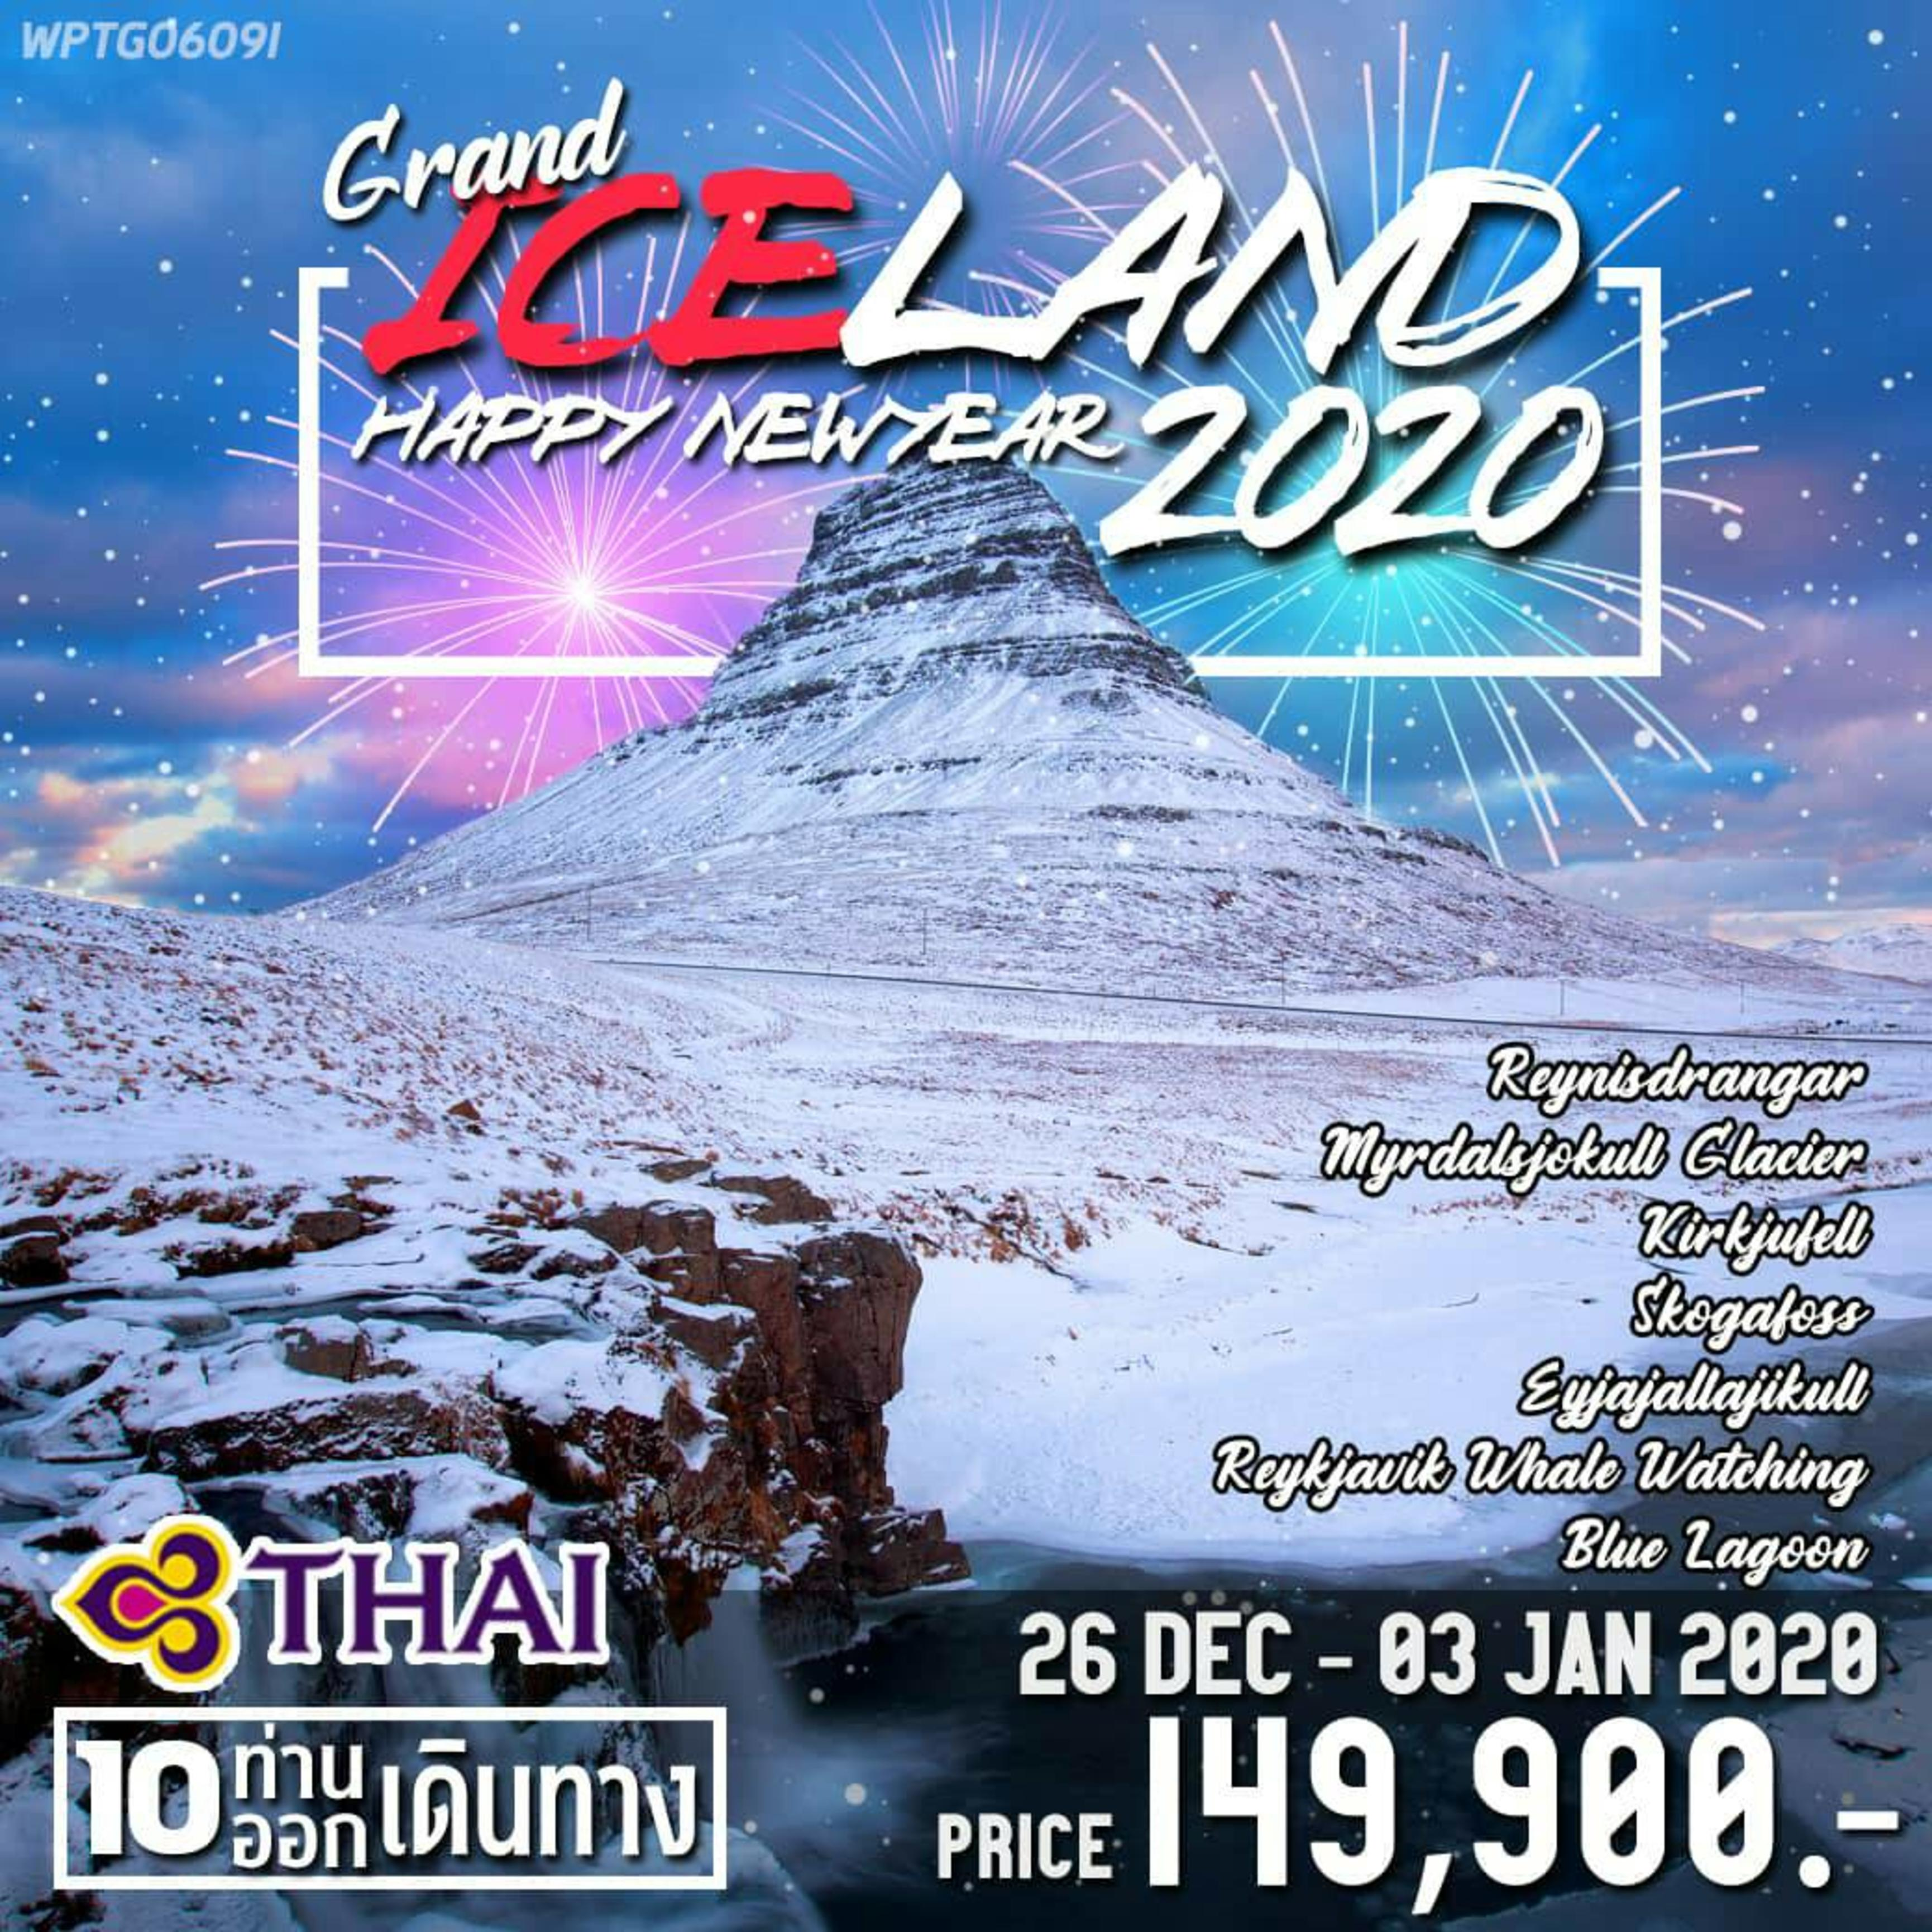 Grand Iceland แกรนด์ไอซ์แลนด์ 09 วัน TG